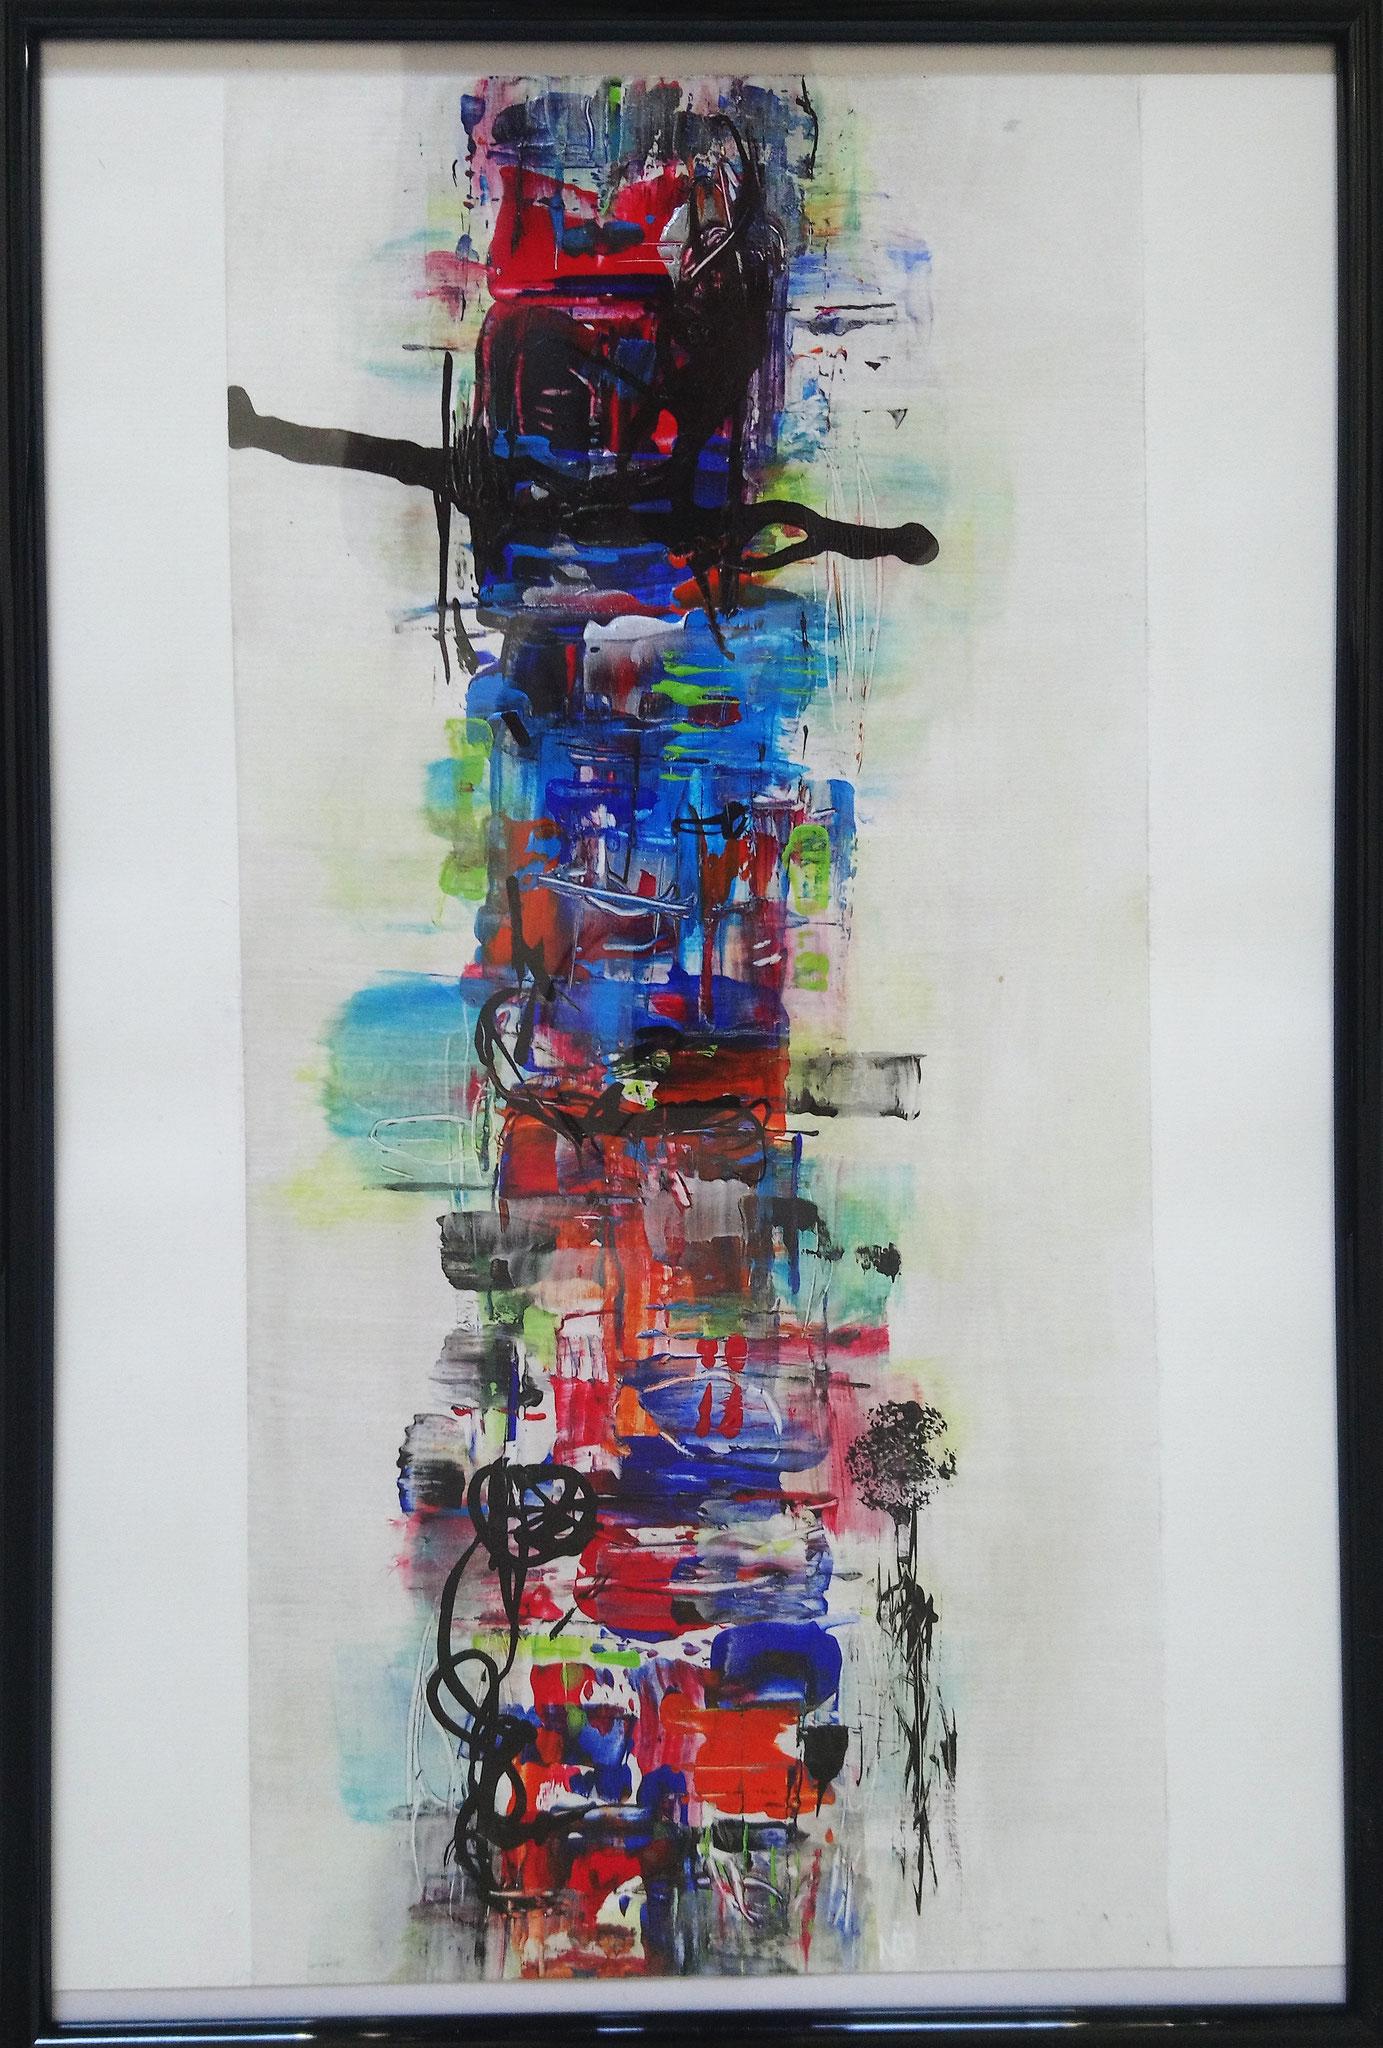 Art 96 - Medulla (31x46x2)